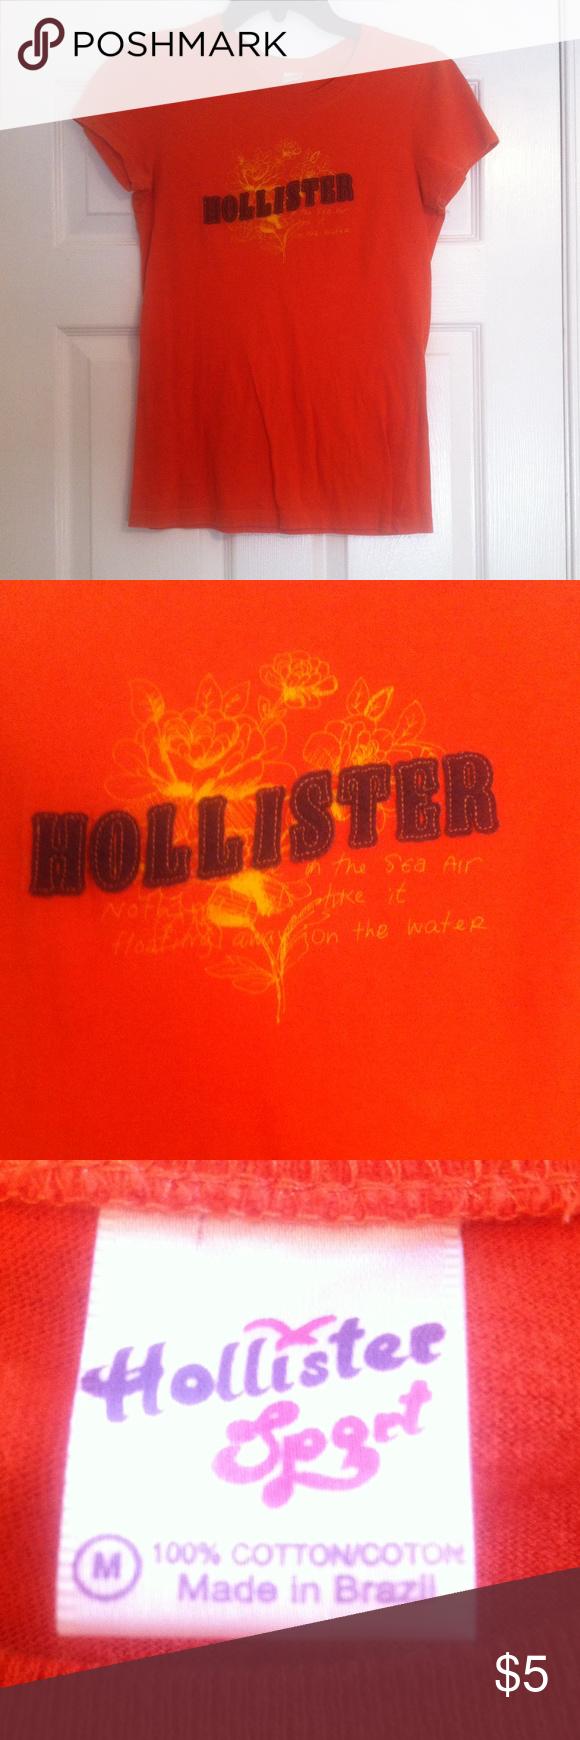 Hollister orange tshirt Hollister orange tshirt Hollister Tops Tees - Short Sleeve